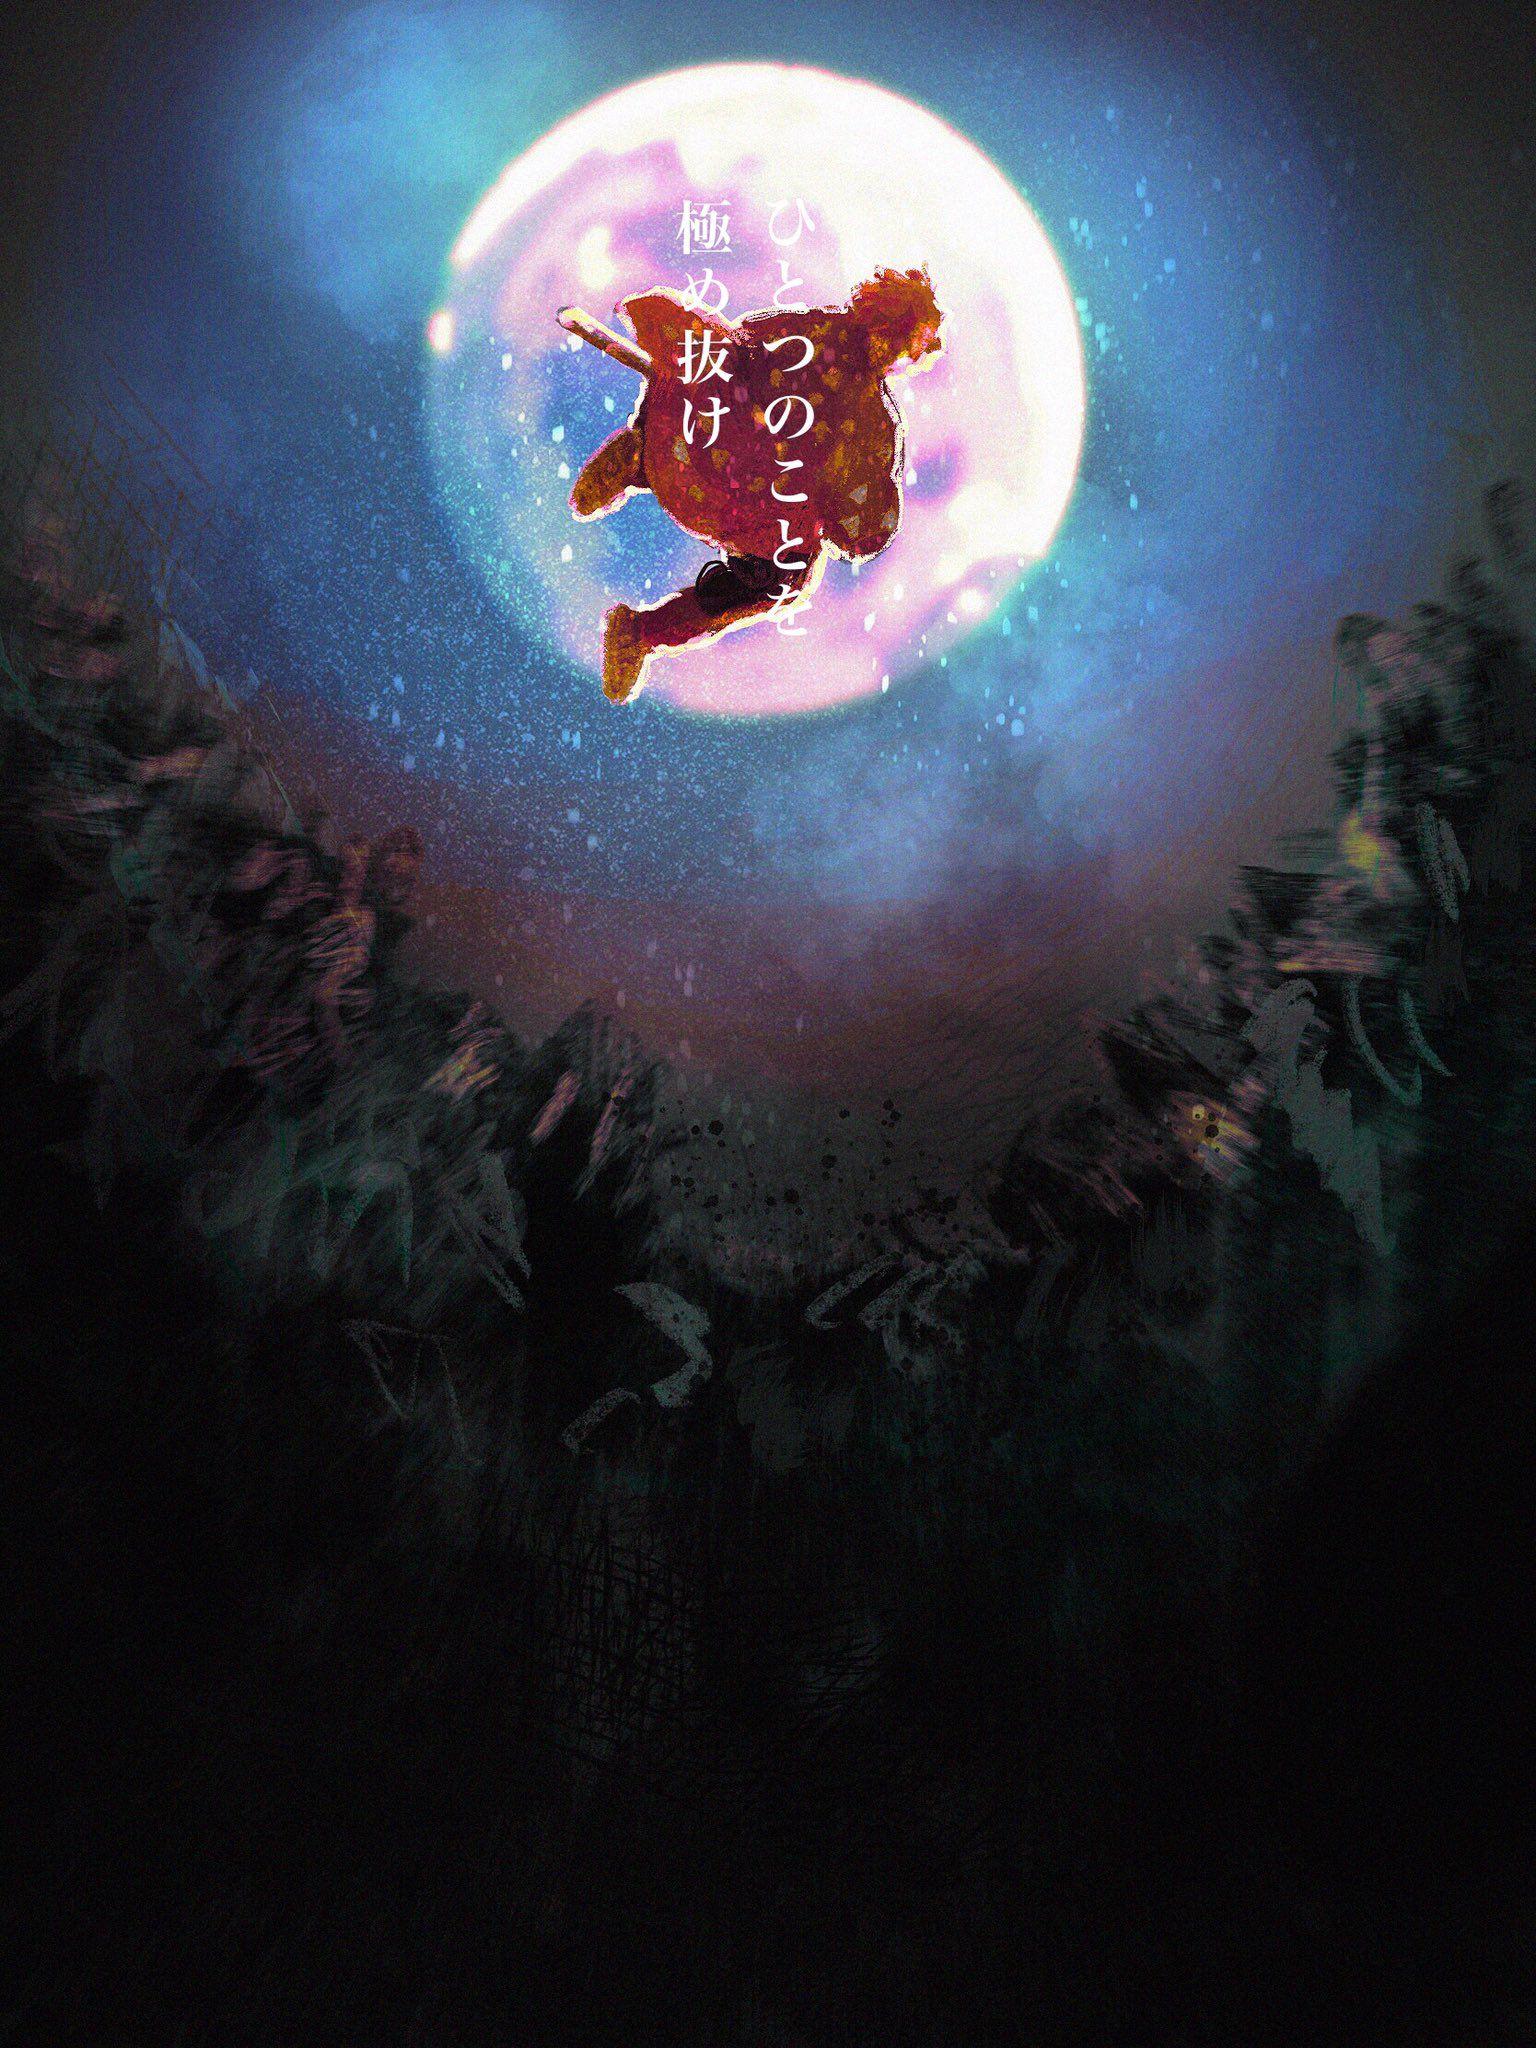 Kimetsu No Yaiba おしゃれまとめの人気アイデア Pinterest Natsuki Iphone 壁紙 アニメ 壁紙 アニメ 善逸 壁紙